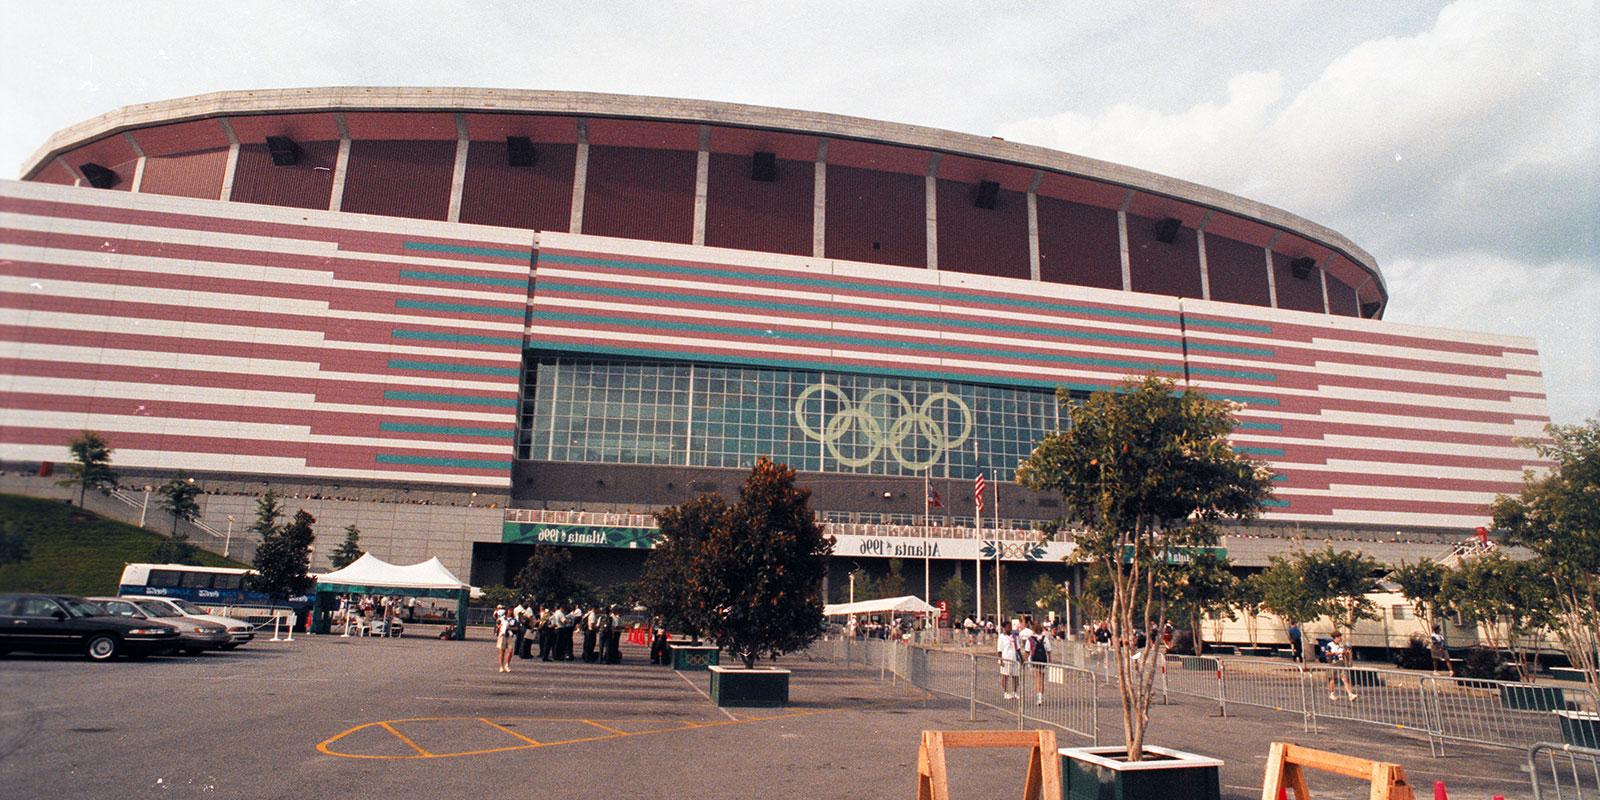 georgia world congress center authority the 3 9 million square